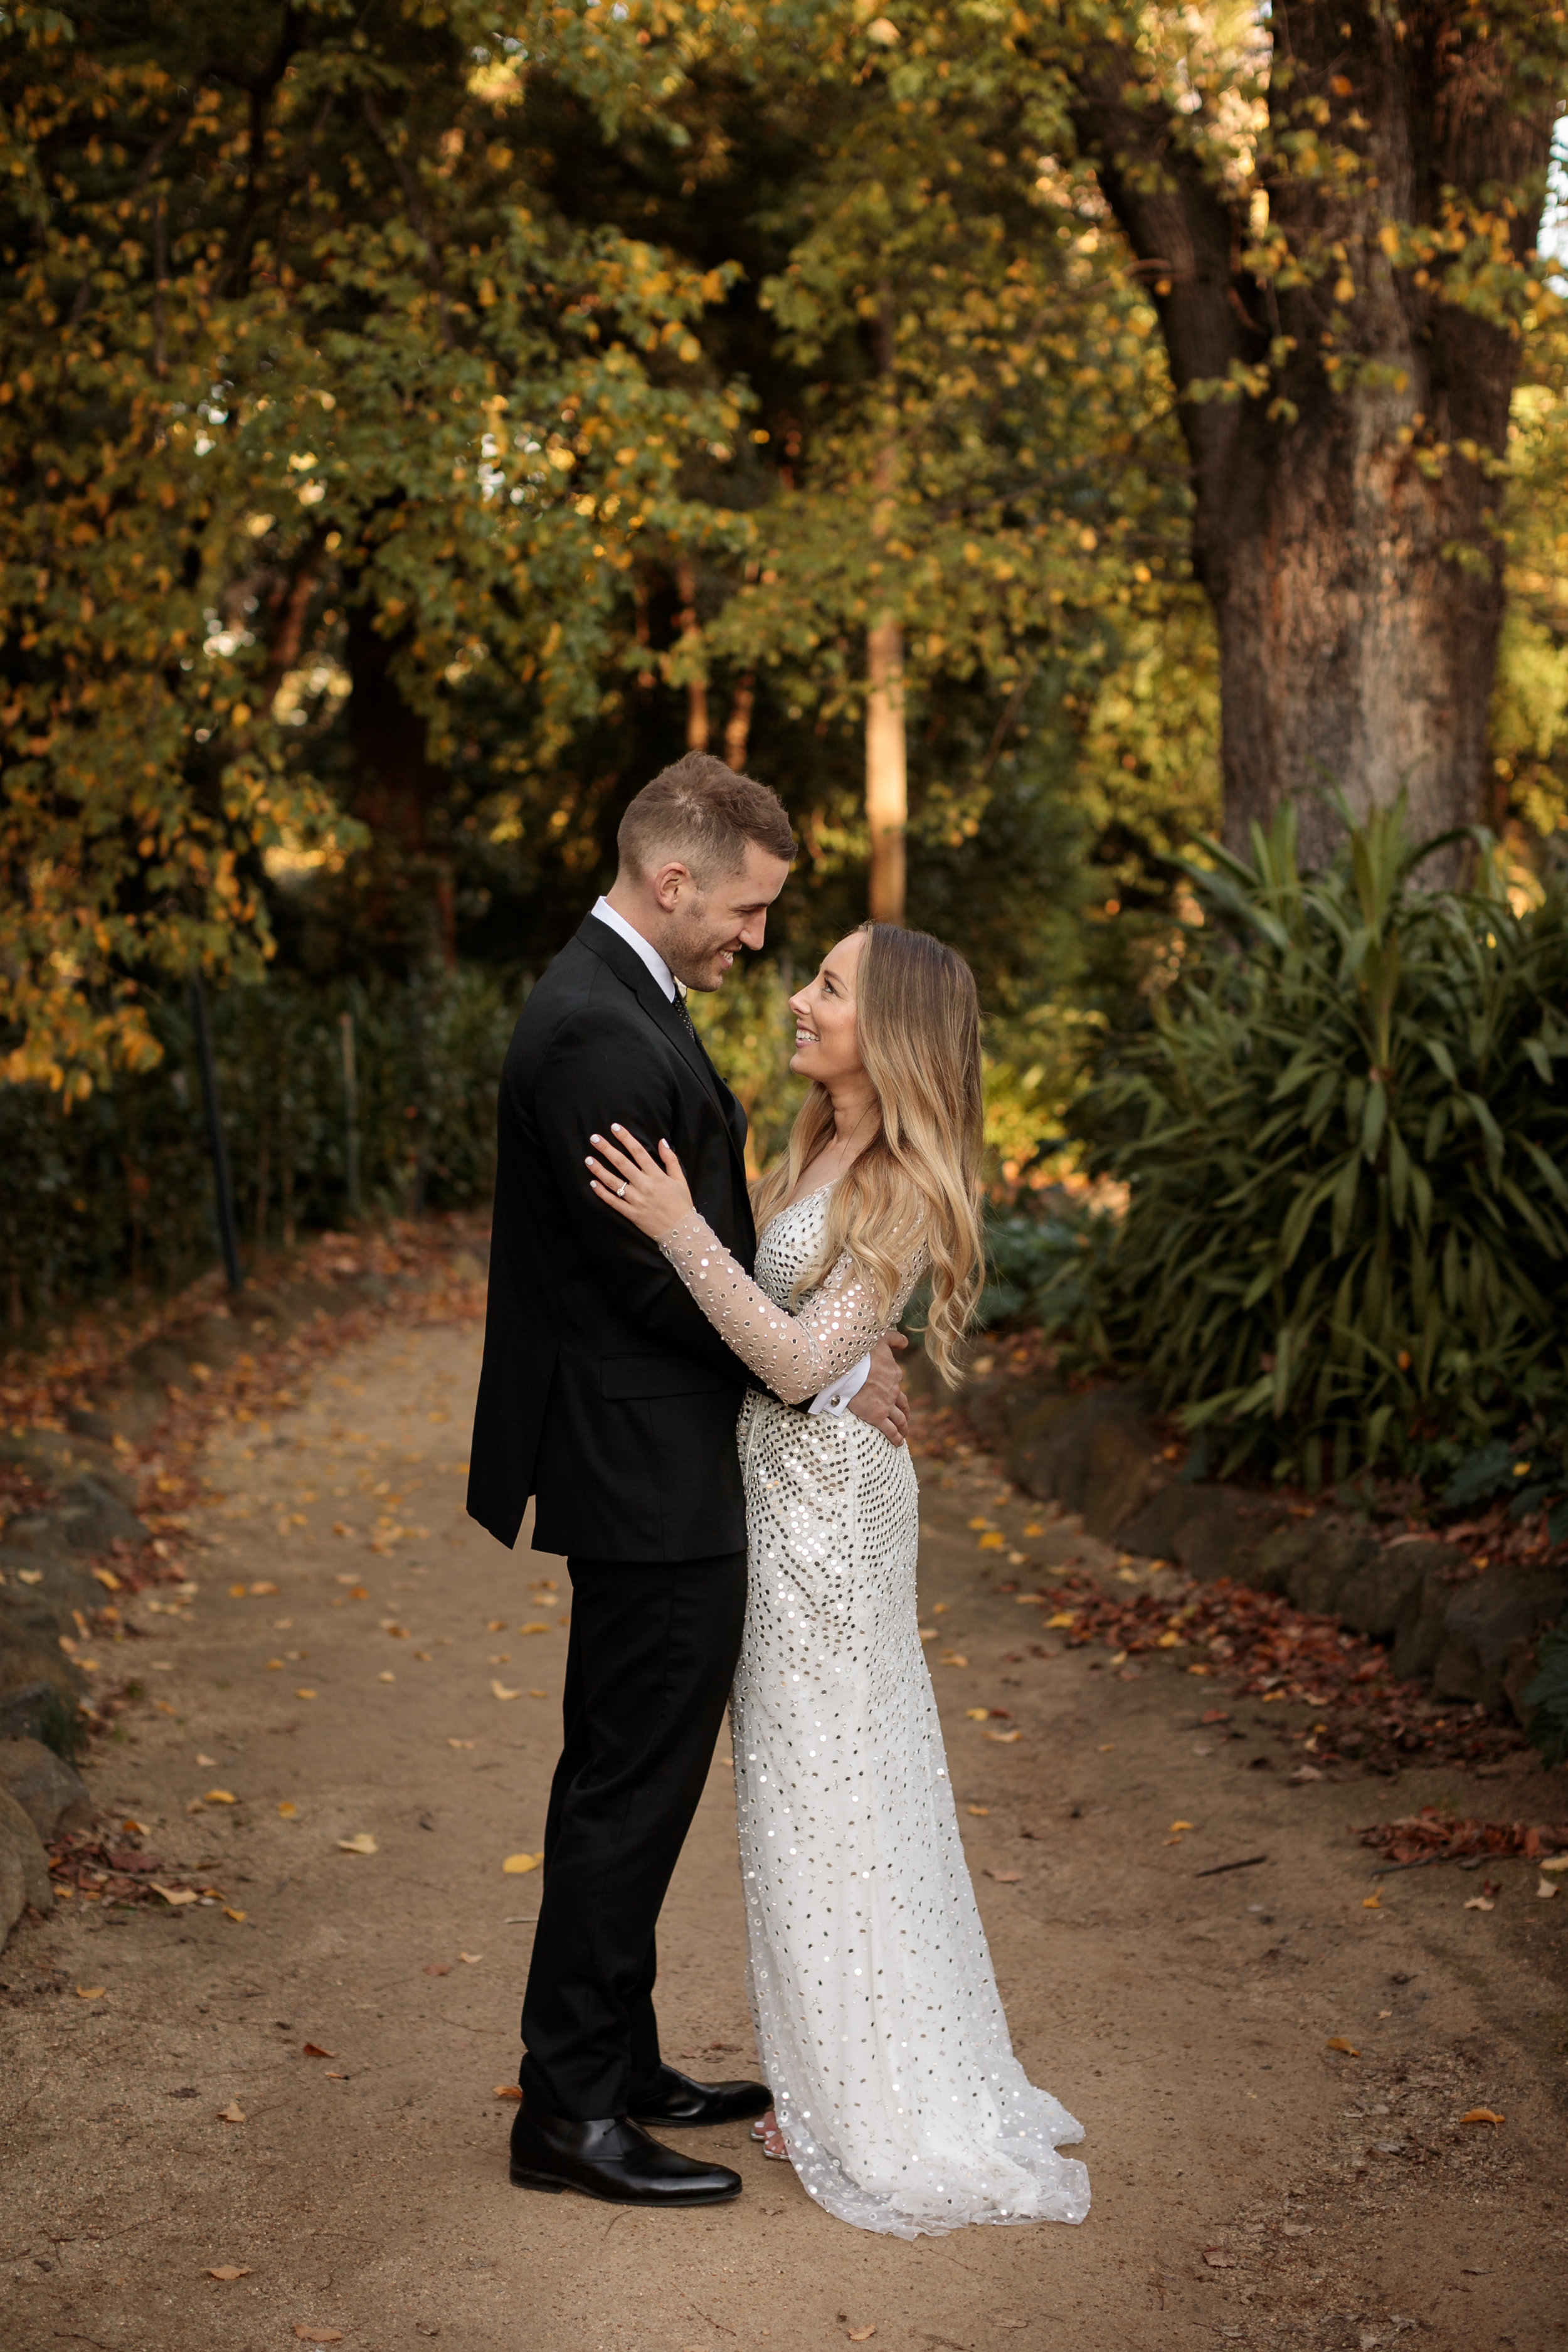 JEREMY-BLODE-Liza + James Wedding Highlights-43.jpg